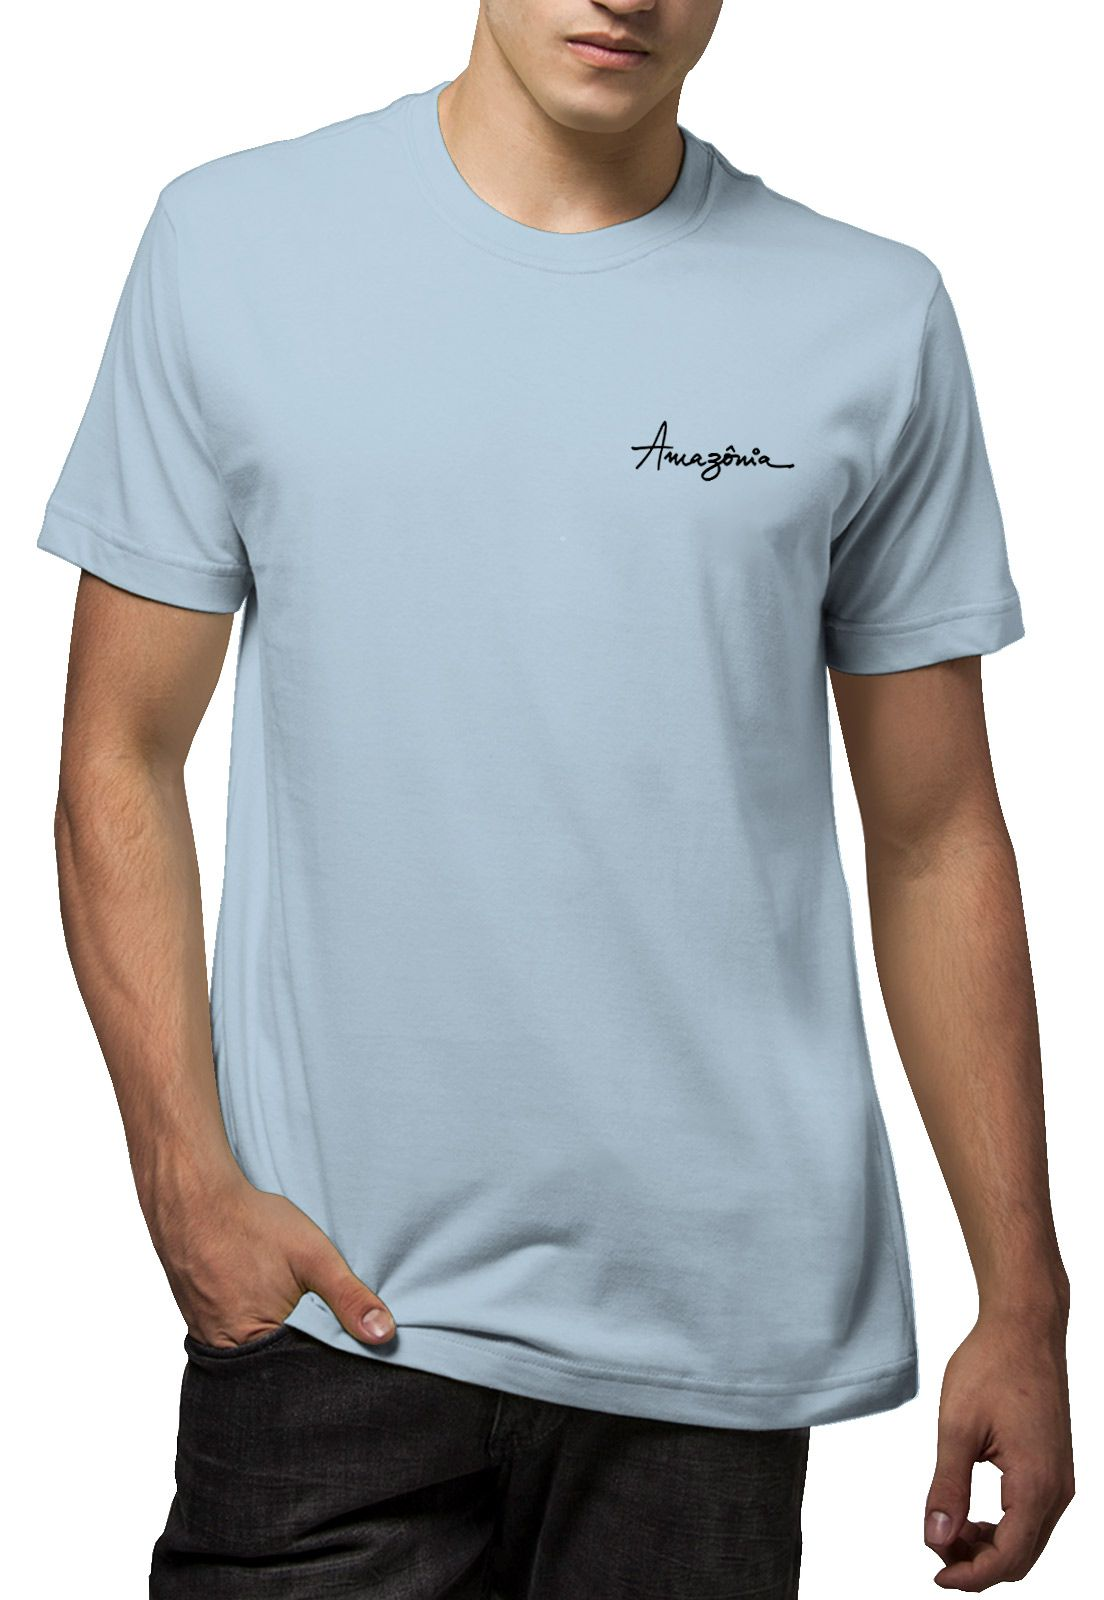 Camiseta Amazônia Peixe Boi - Azul